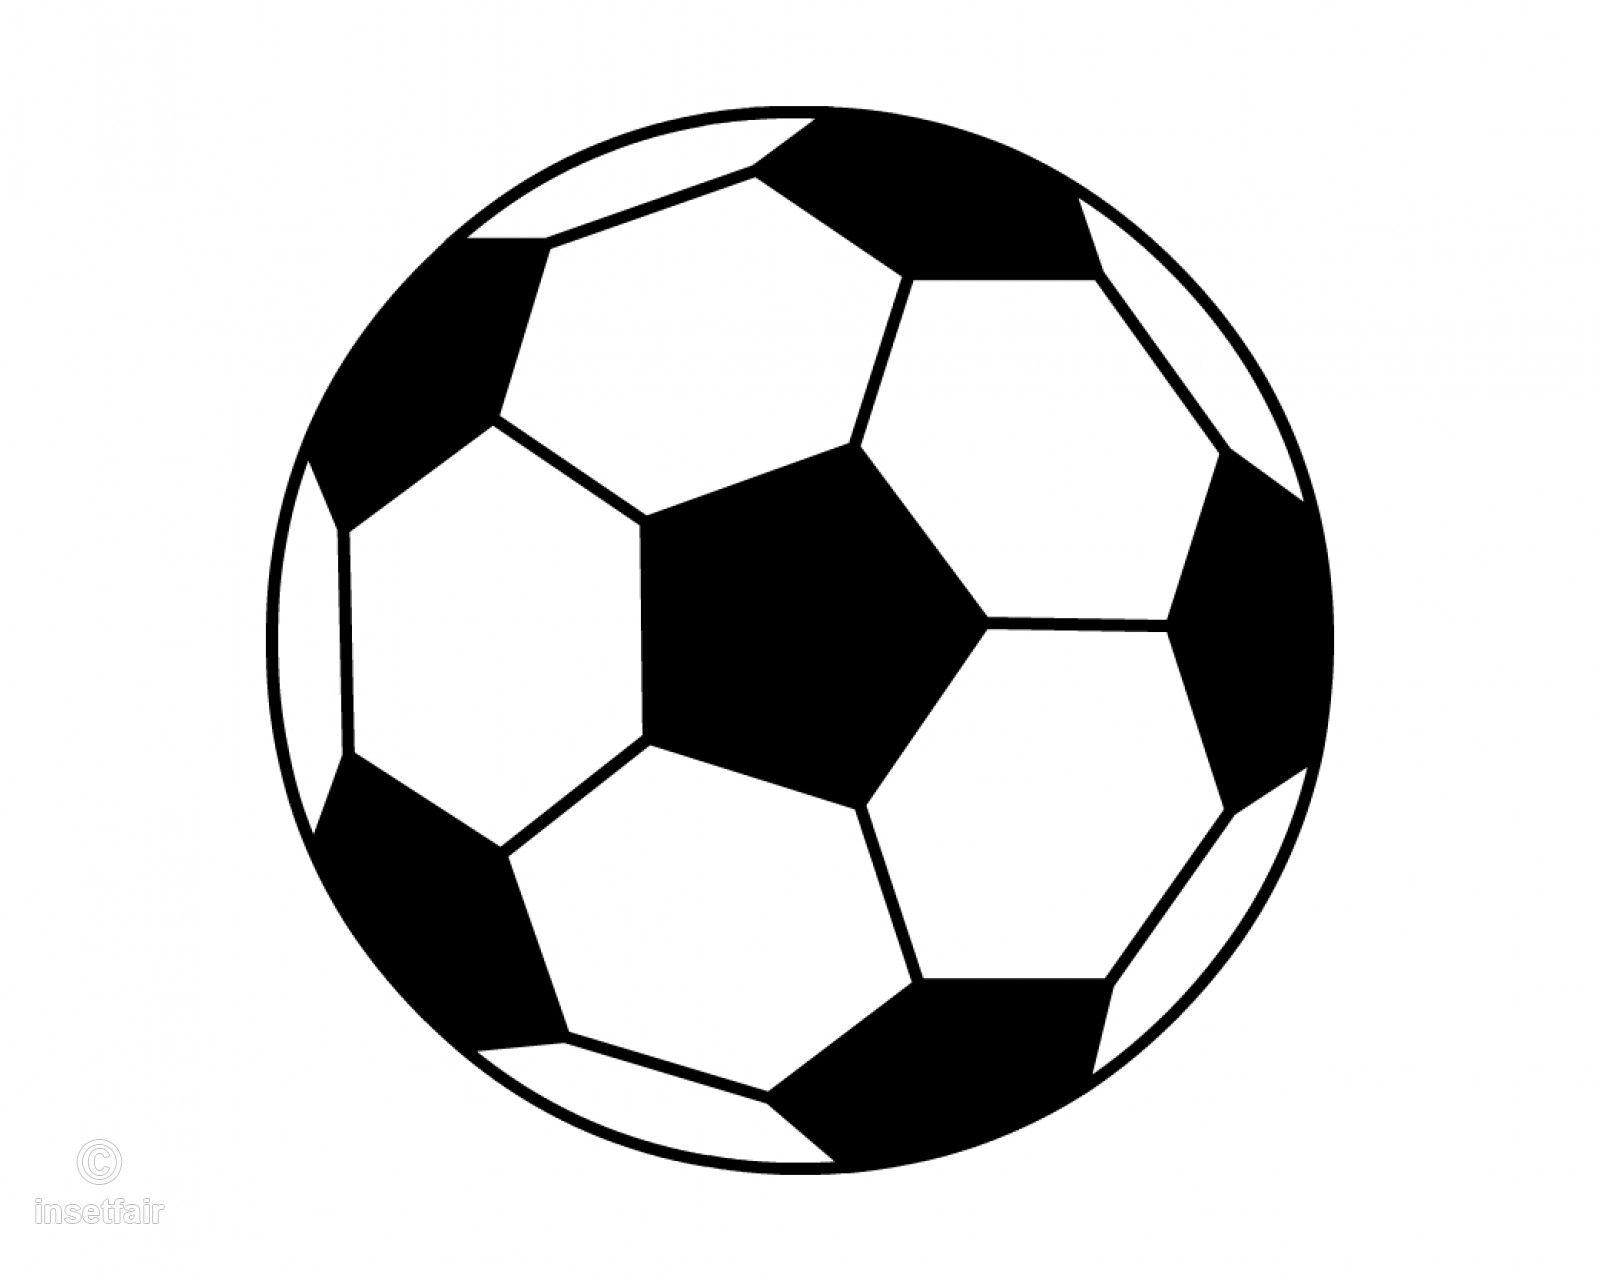 Pin Oleh Enosart Com Di Sport Clipart